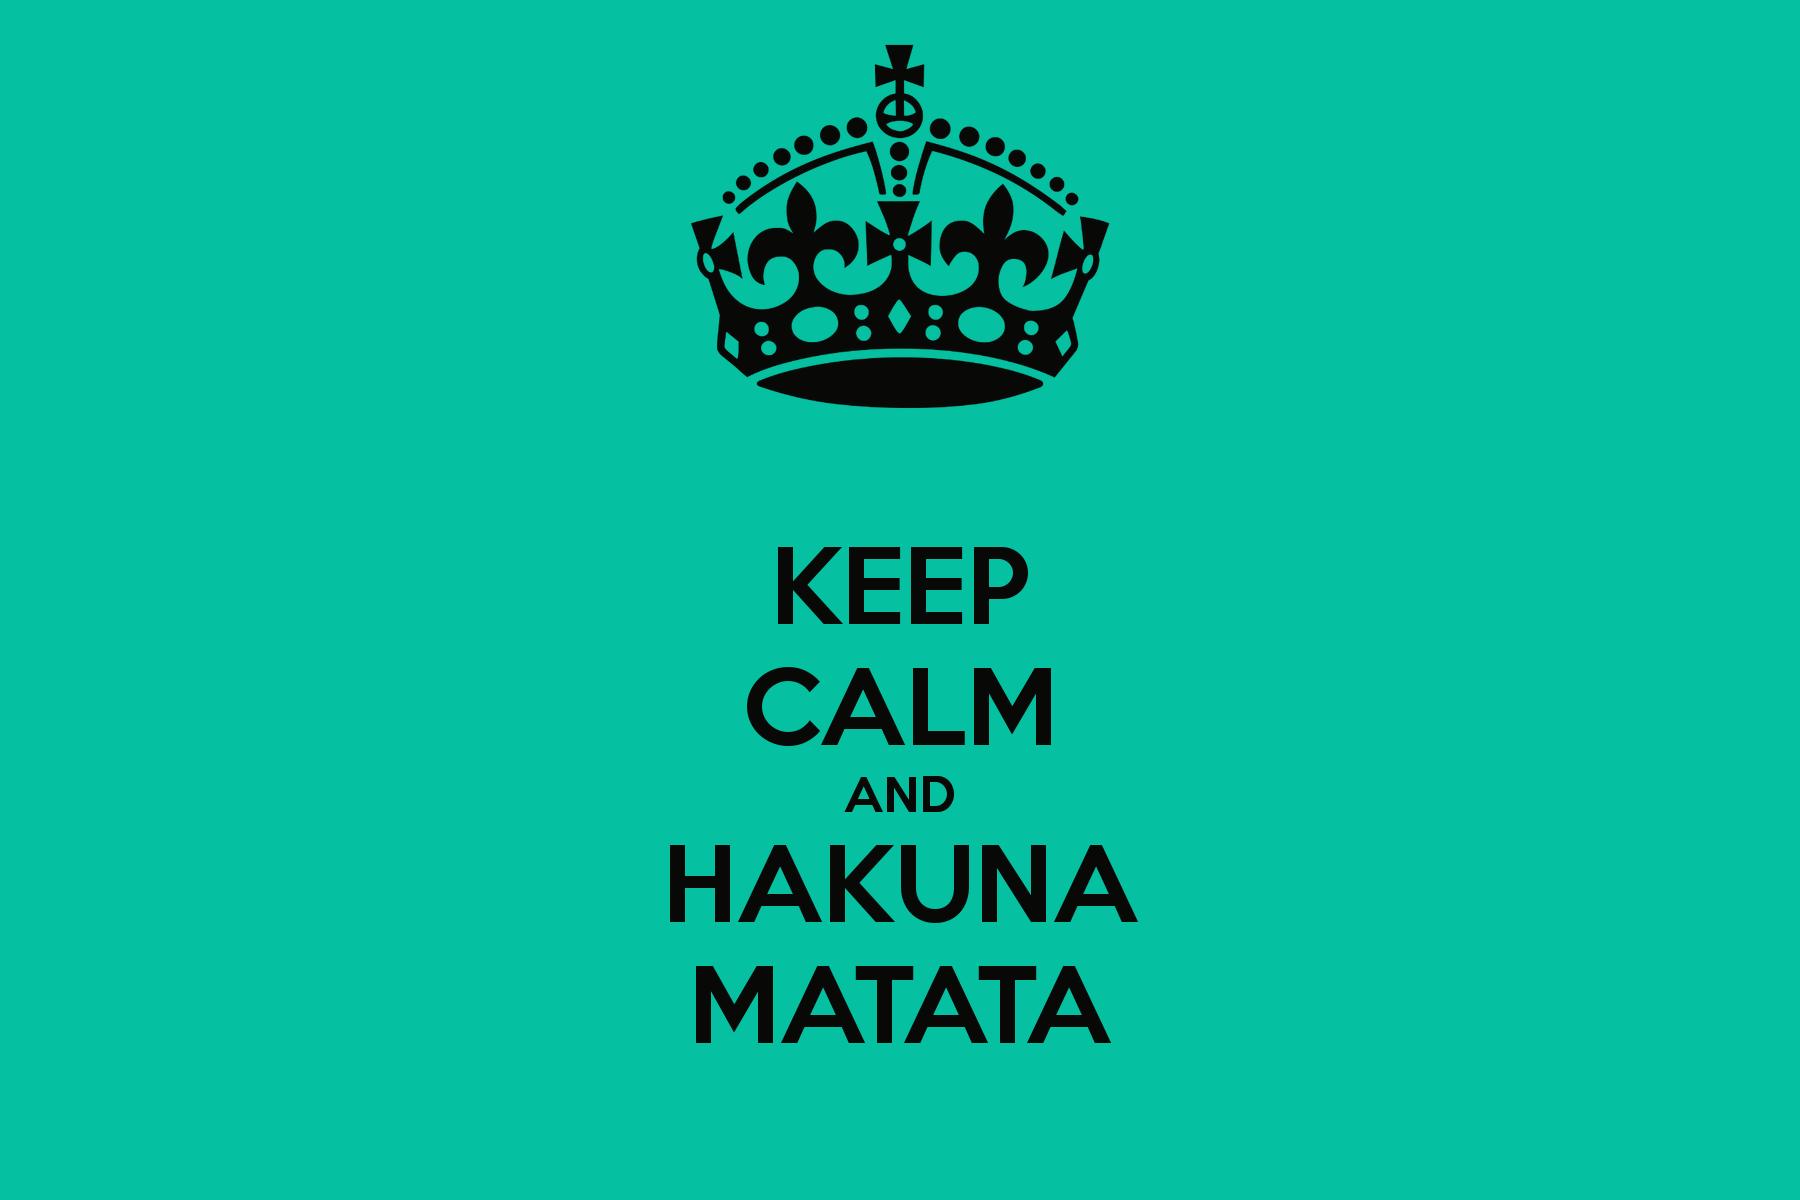 Hakuna Matata Wallpapers - Wallpaper Cave